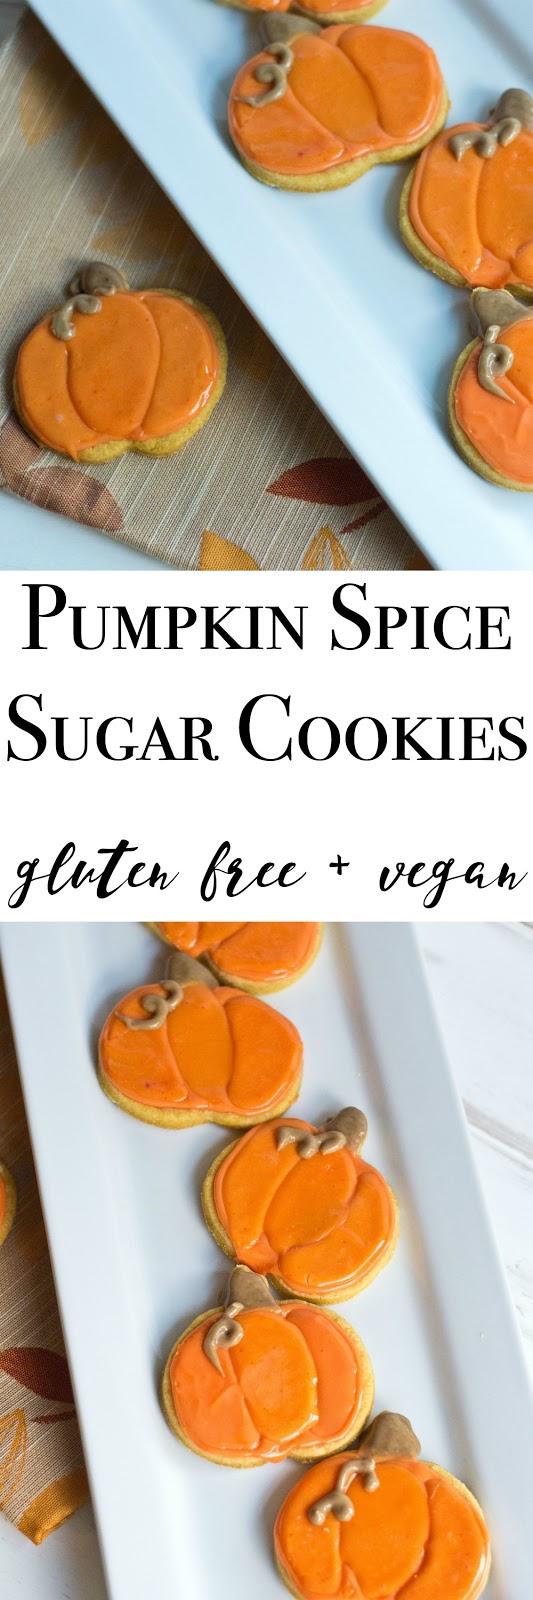 Making it Milk-free: Pumpkin Spice Sugar Cookies {gluten free + vegan}